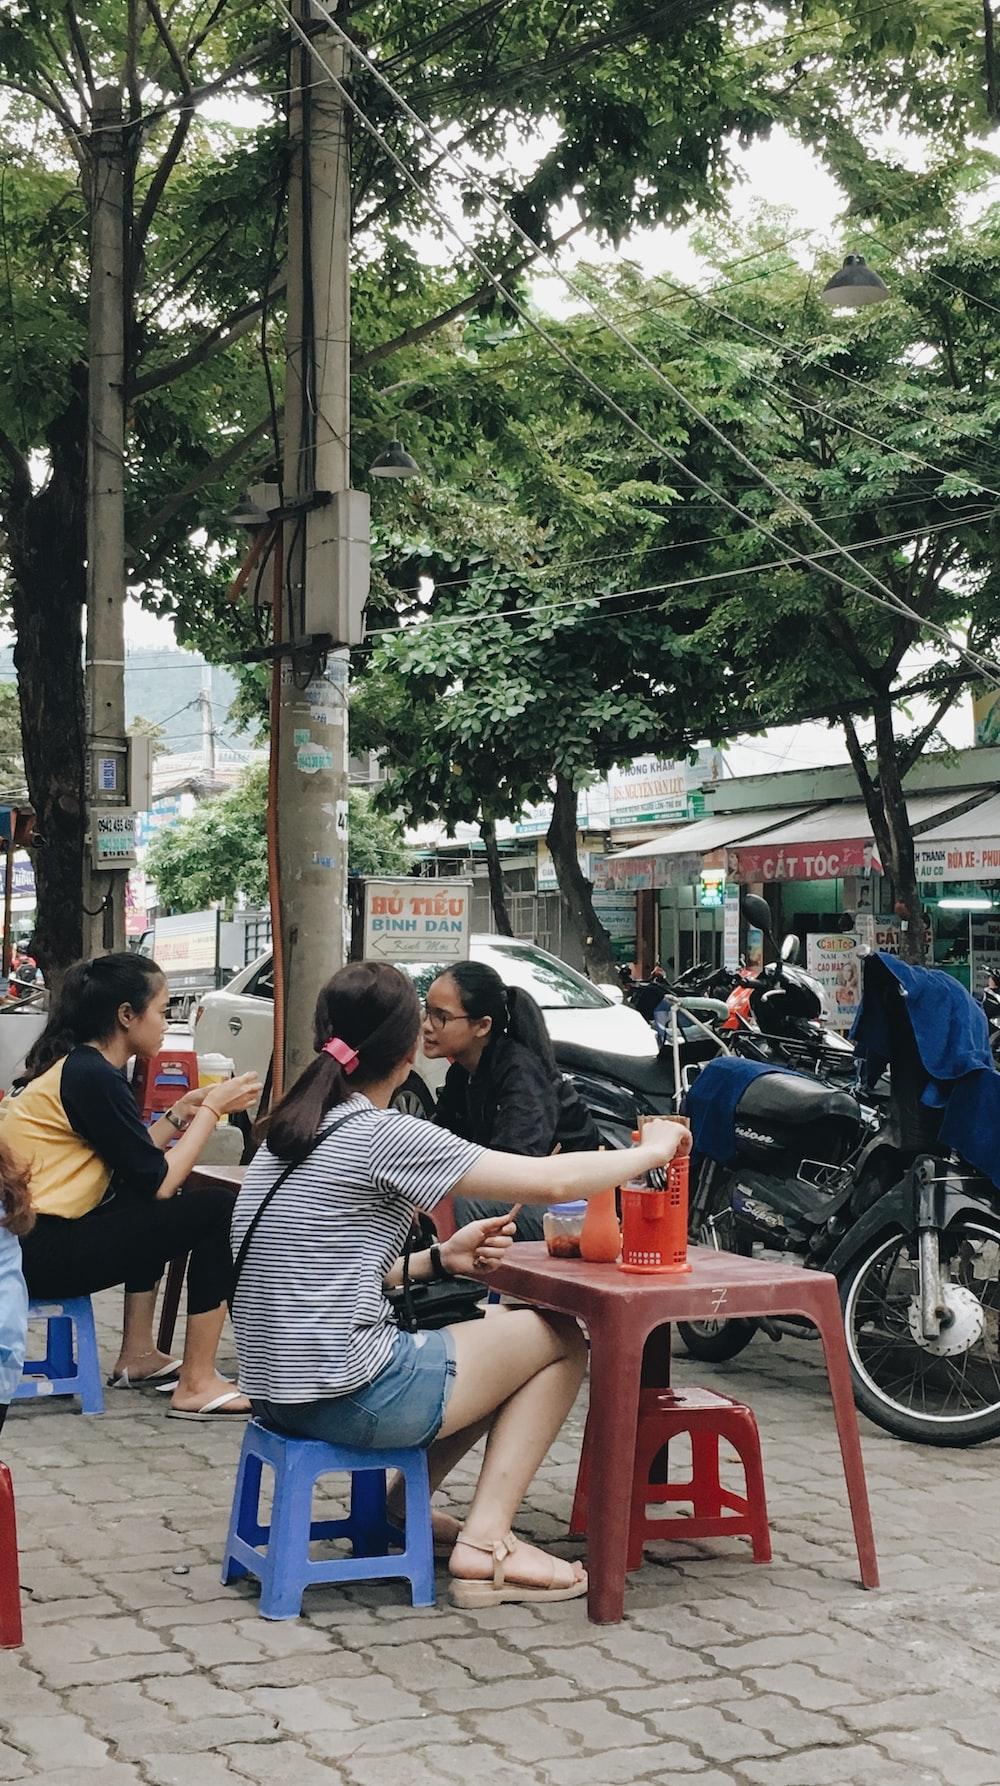 three women sitting near parked black motorcycle